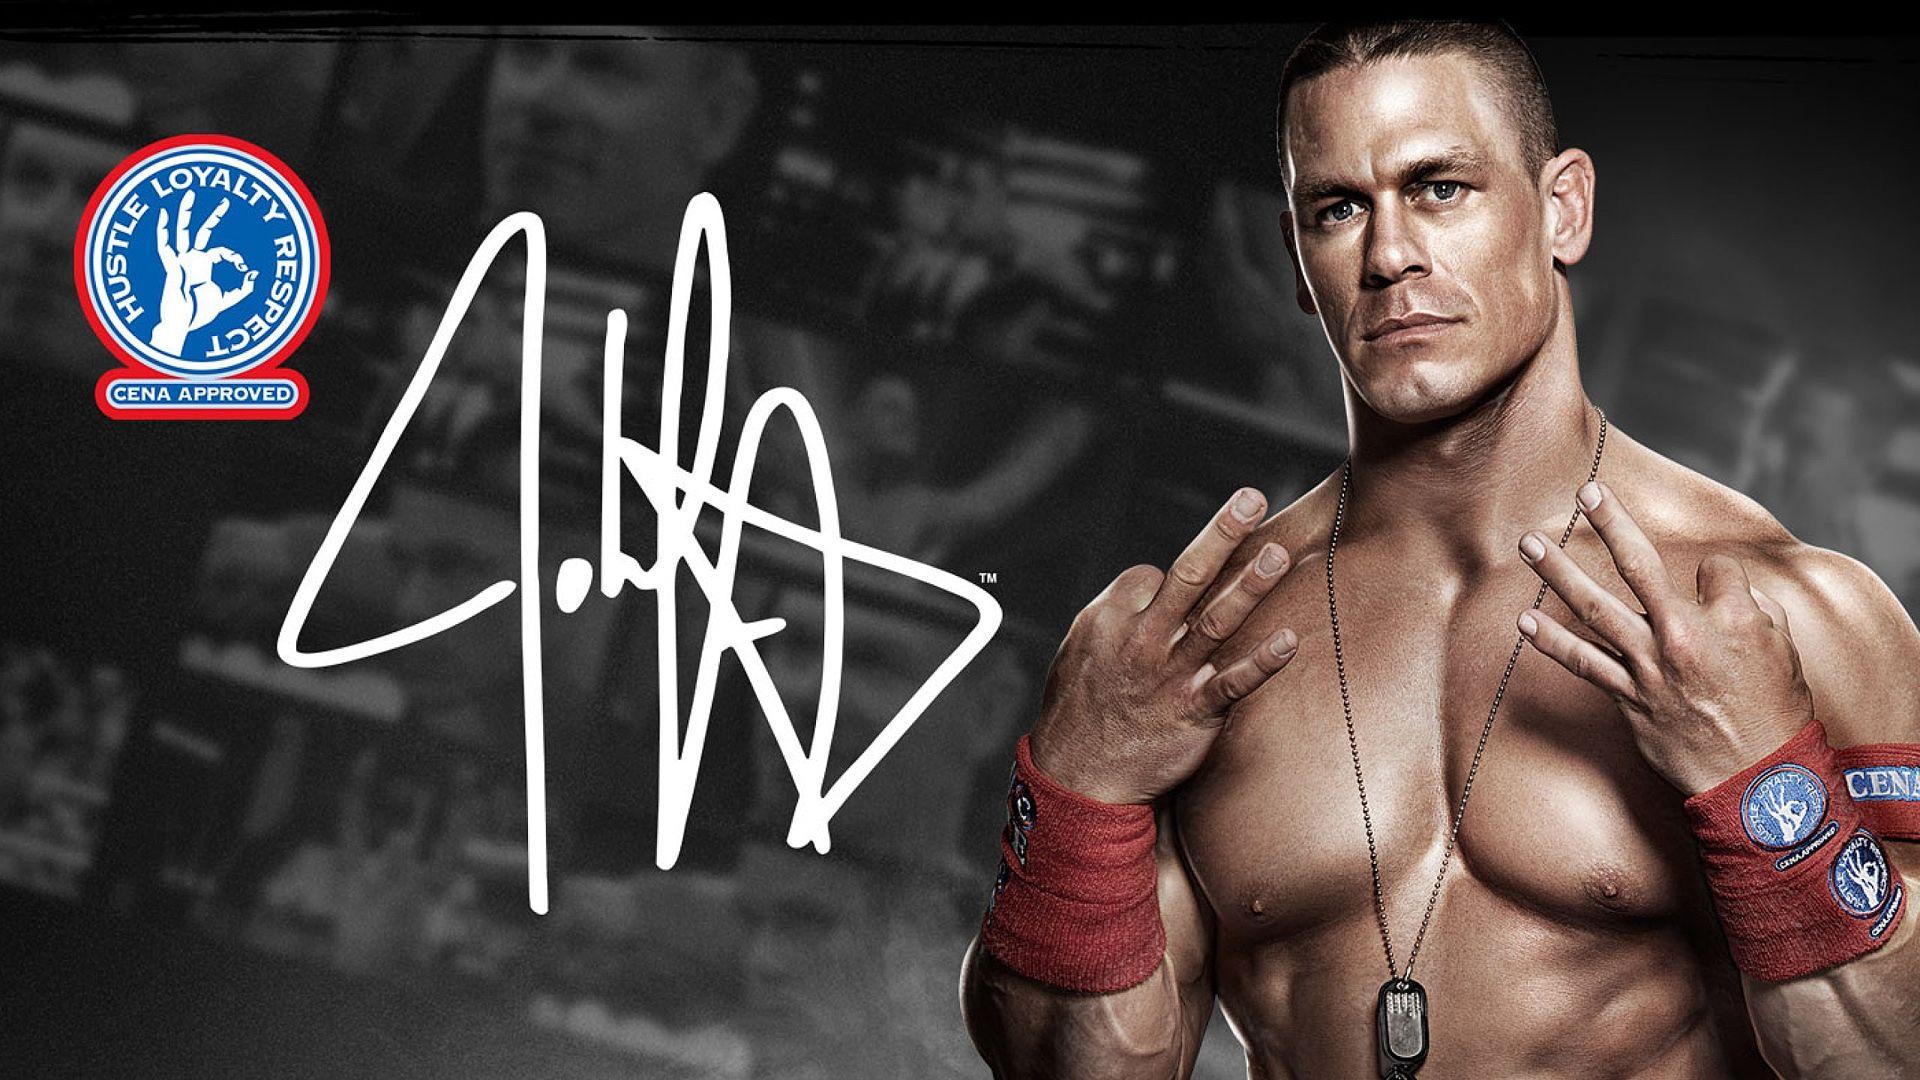 John Cena Hd Wallpapers 2013 43406 Wallpaper